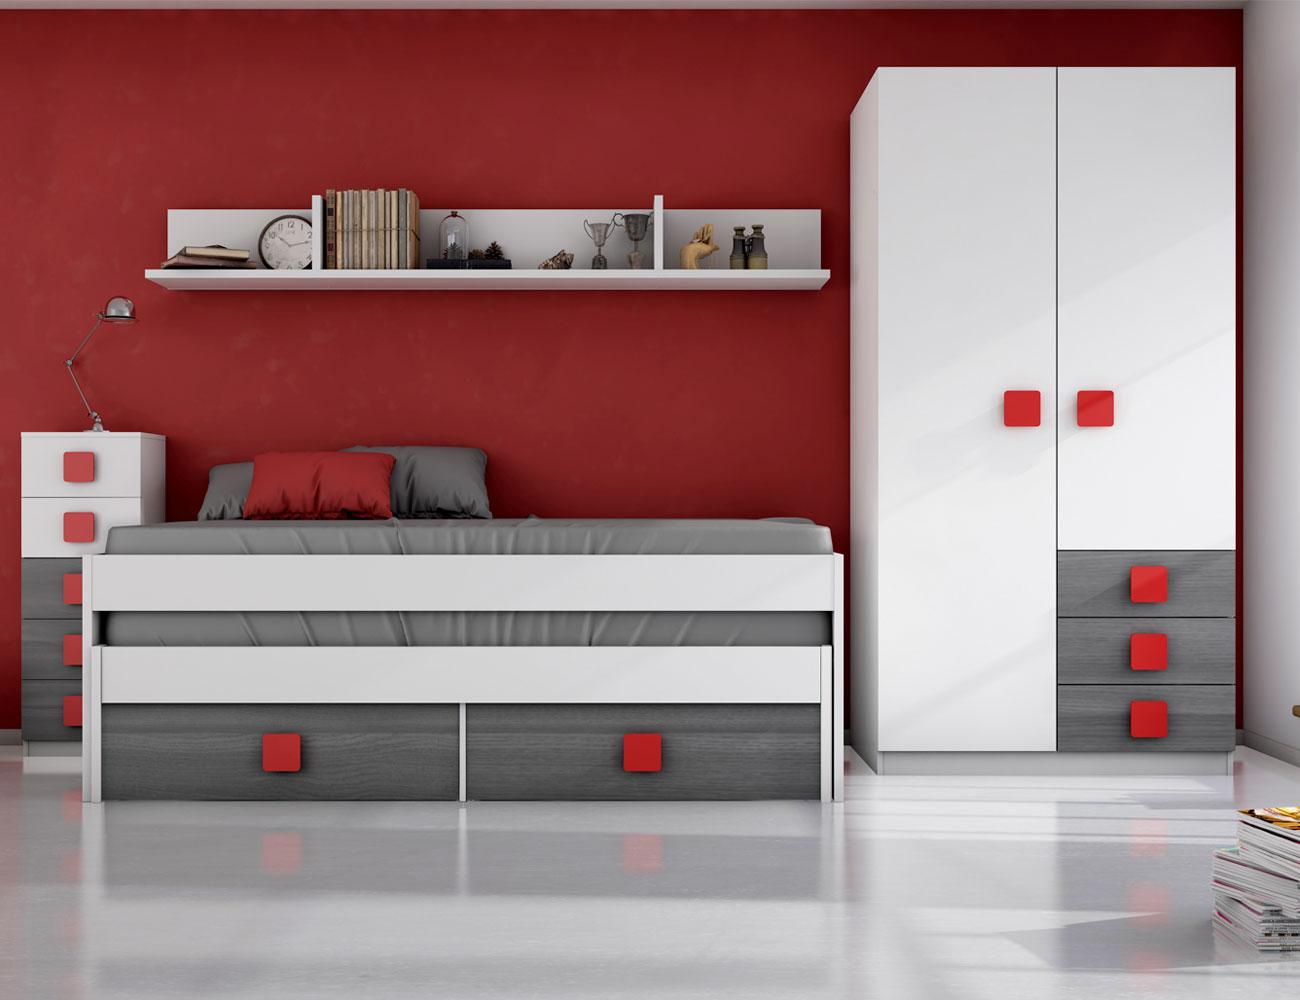 Dormitorio juvenil ceniza rojo1